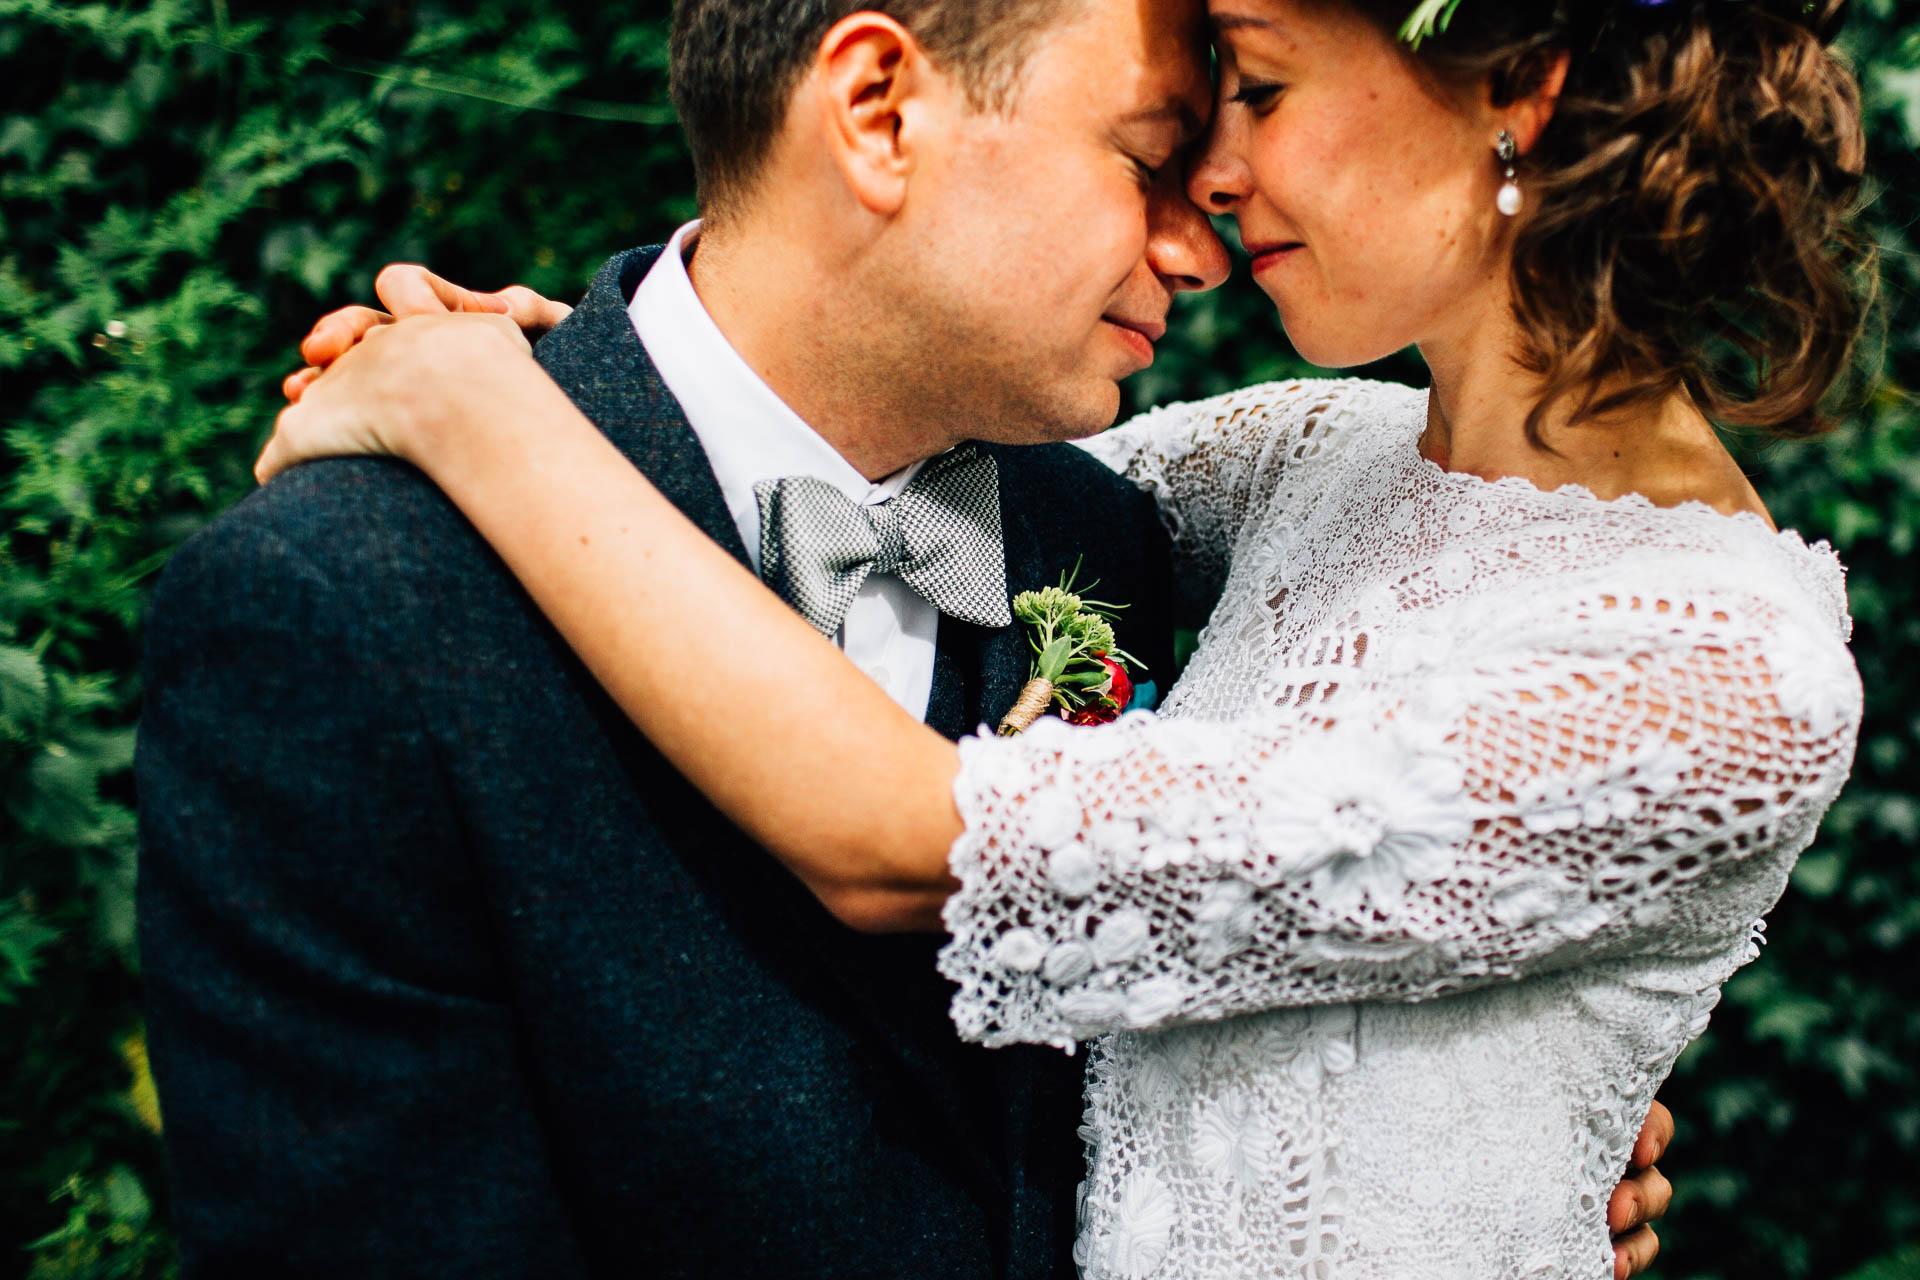 winterbourne-medieval-barn-wedding-photography-emma-andrew-74